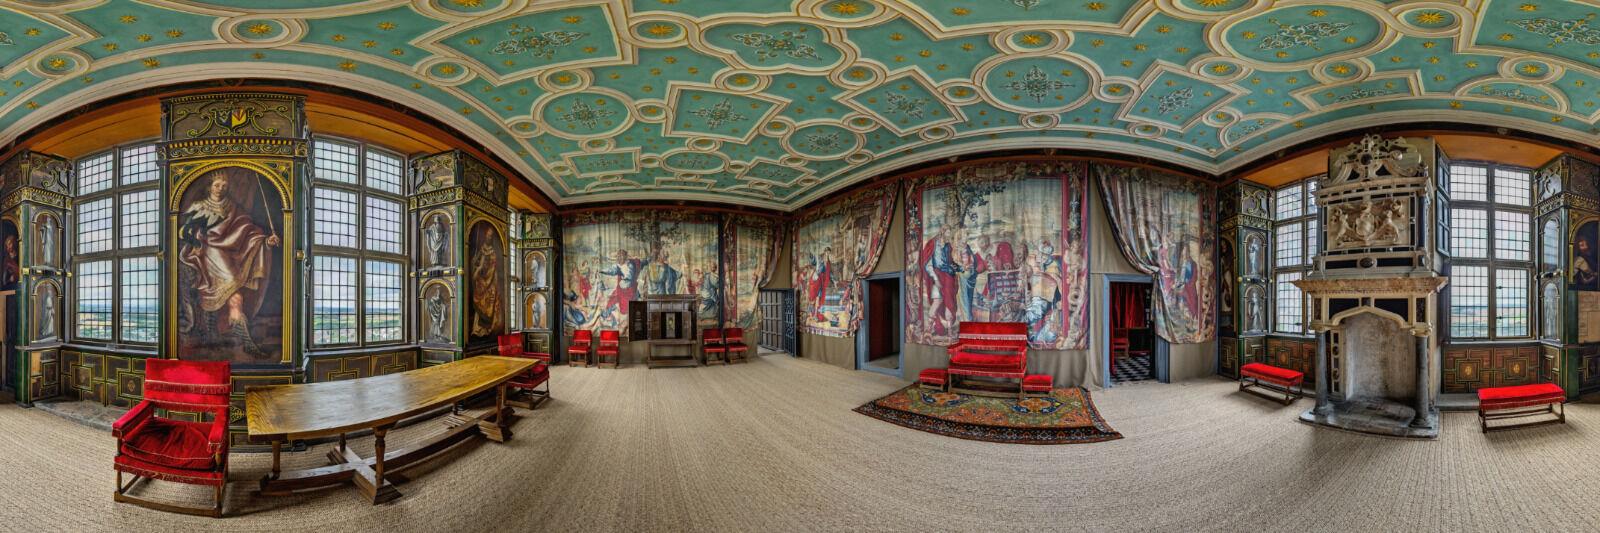 Letterbox - Second - Star Chamber - Bolsover Castle - Andrzej Jablonski